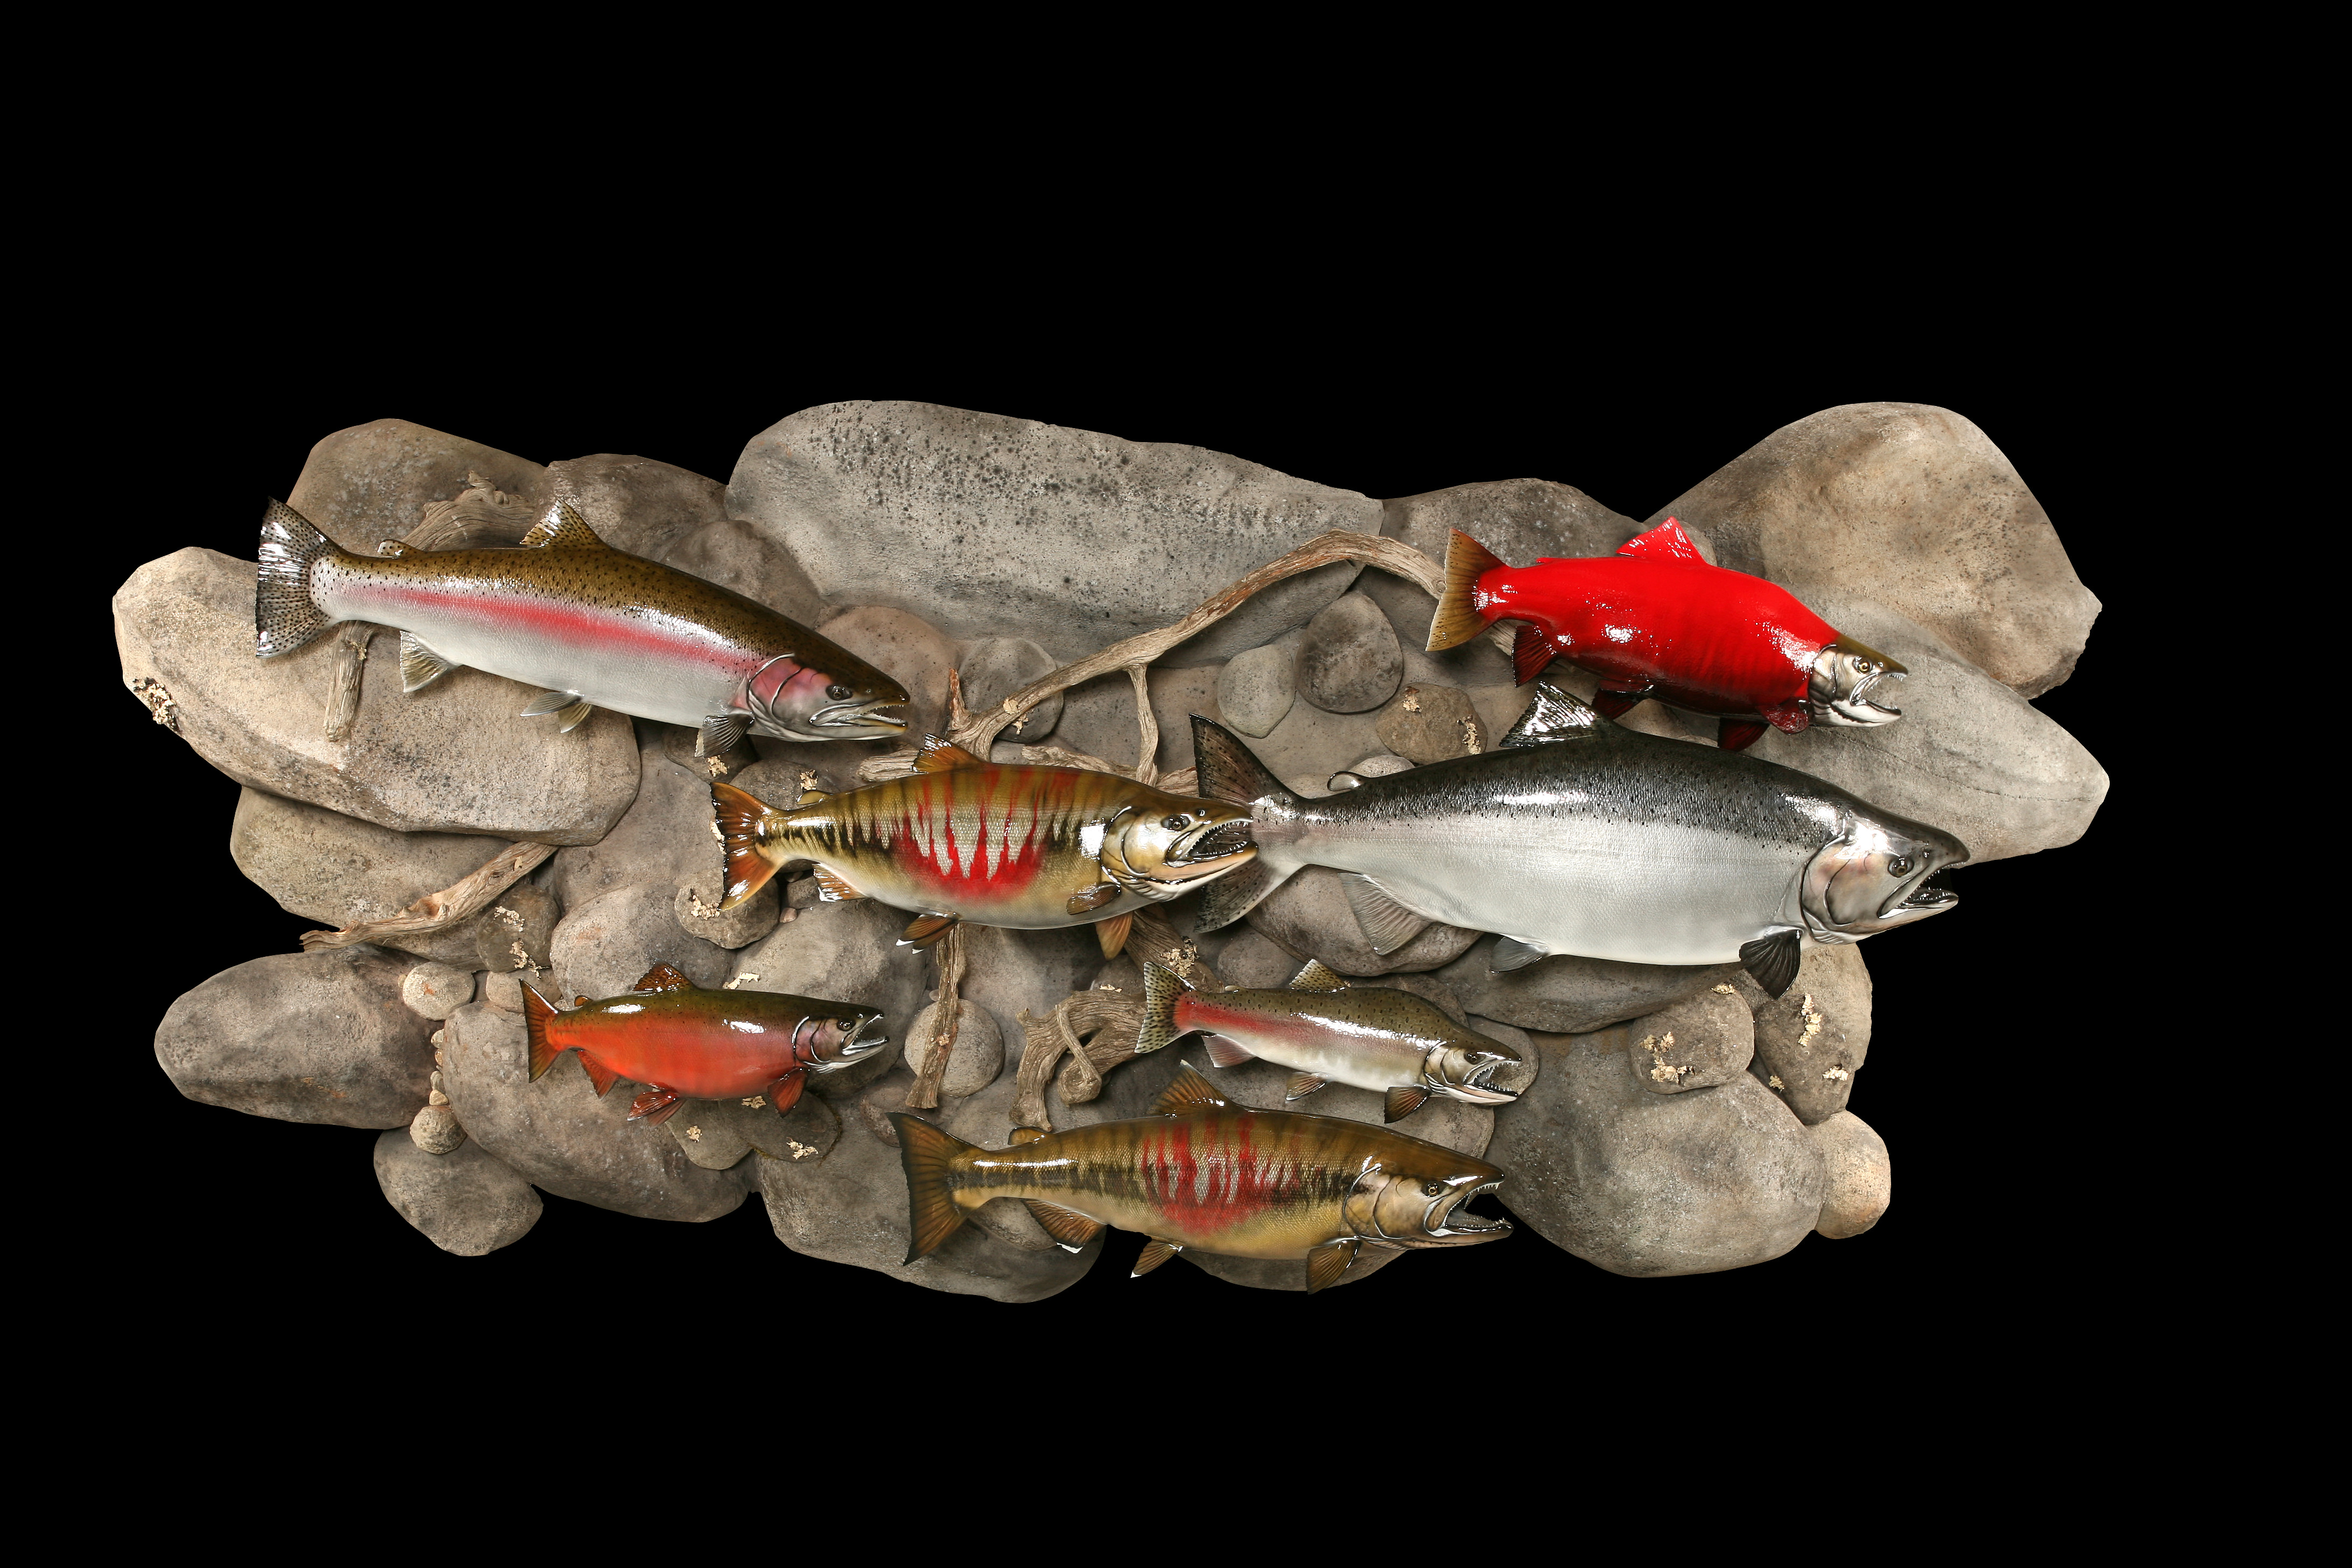 Chinook, Coho, Chum, Pink, Sockeye, and Steelhead Salmon